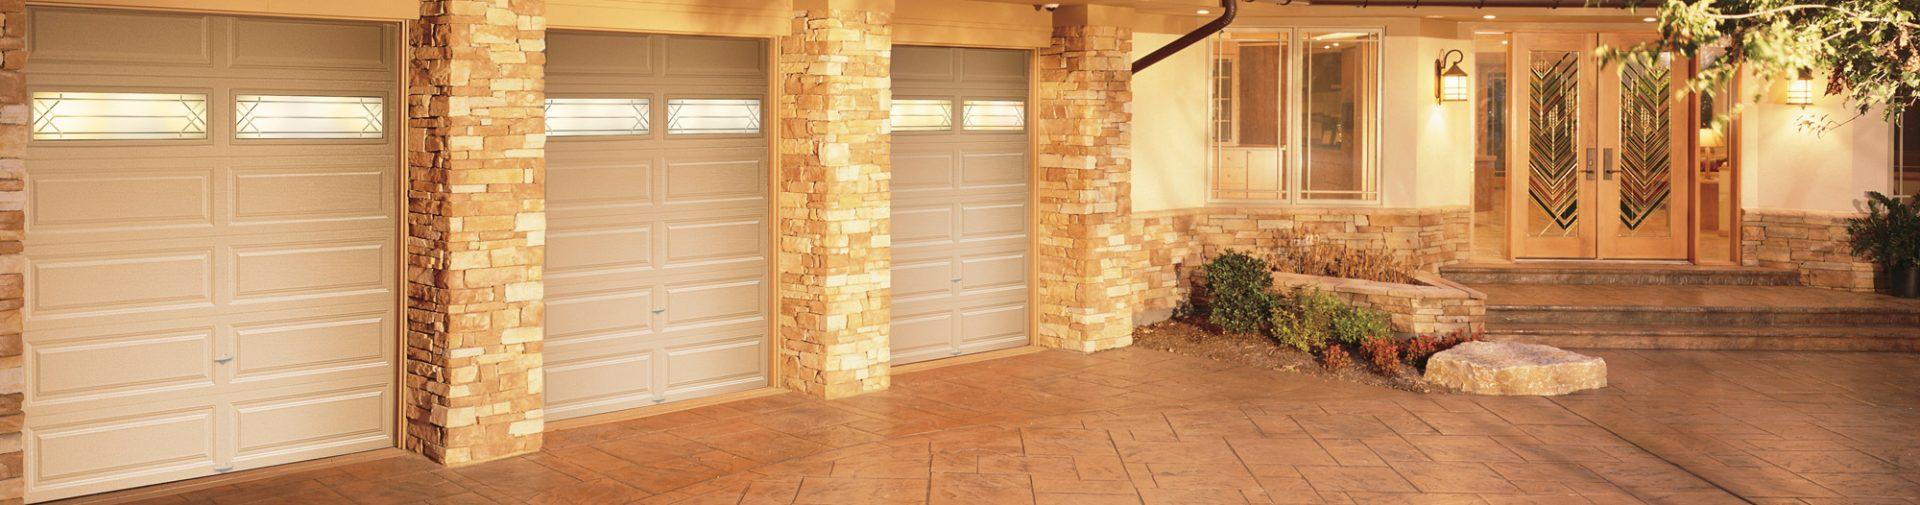 Garage Door Installation Services For Cincinnati And